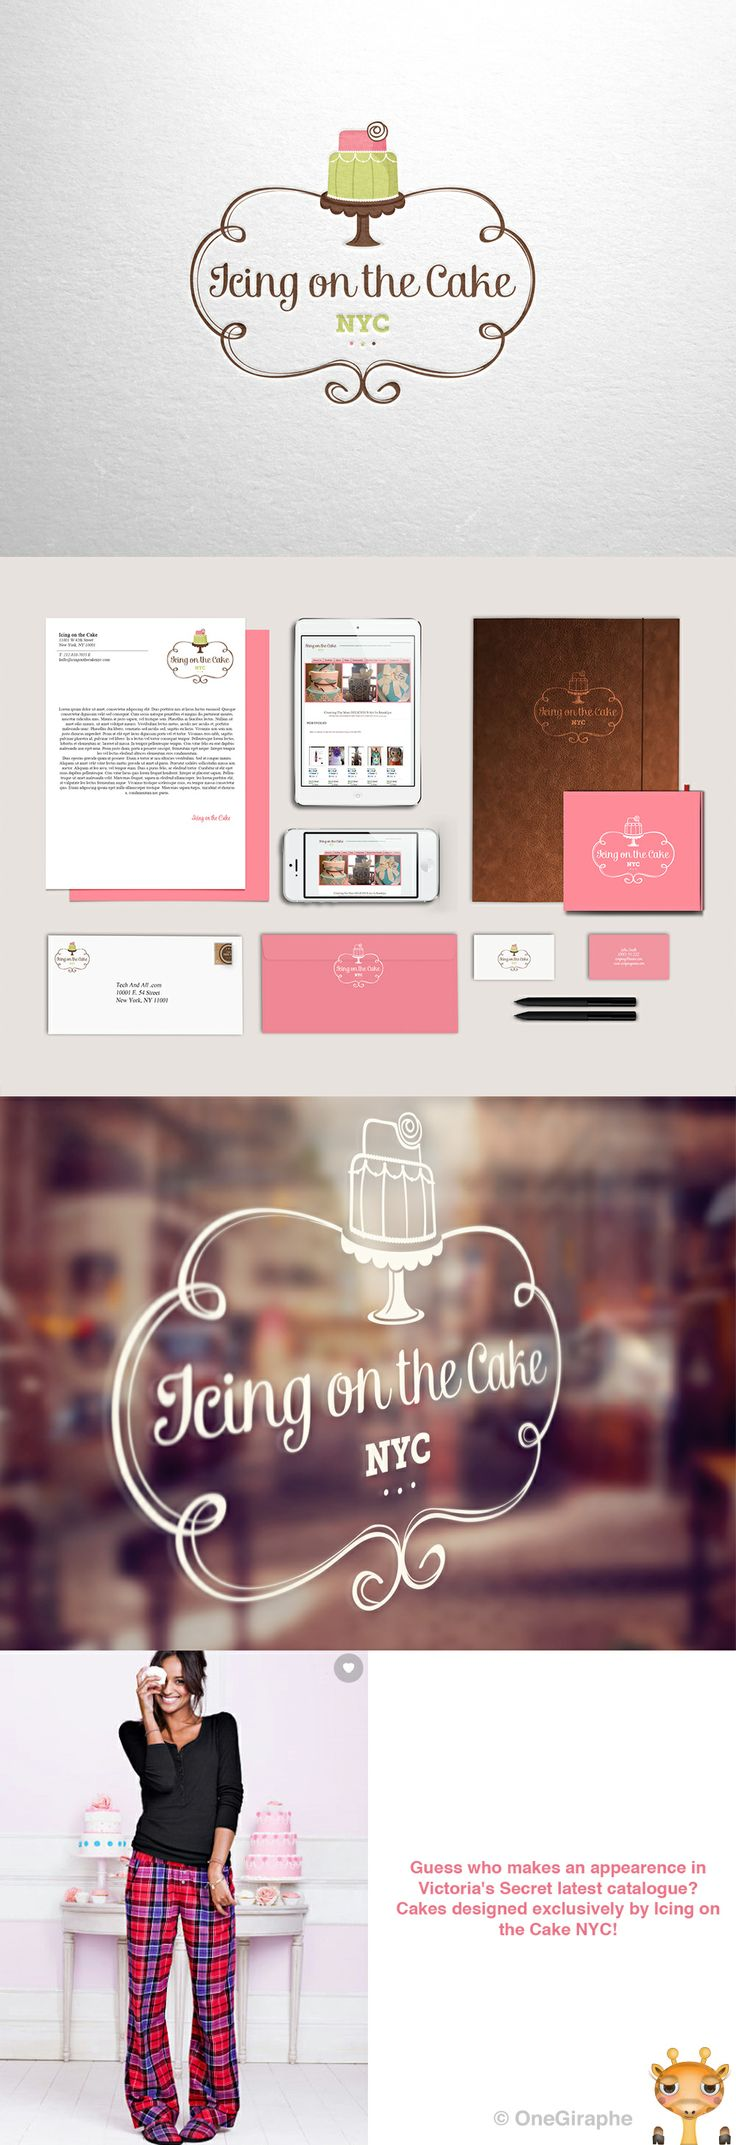 #logo #portfolio #design #graphic #graphicdesign #designer #cute #cake #stand #cupcake #pink #behance #logopond #brandstack #bestdesigner